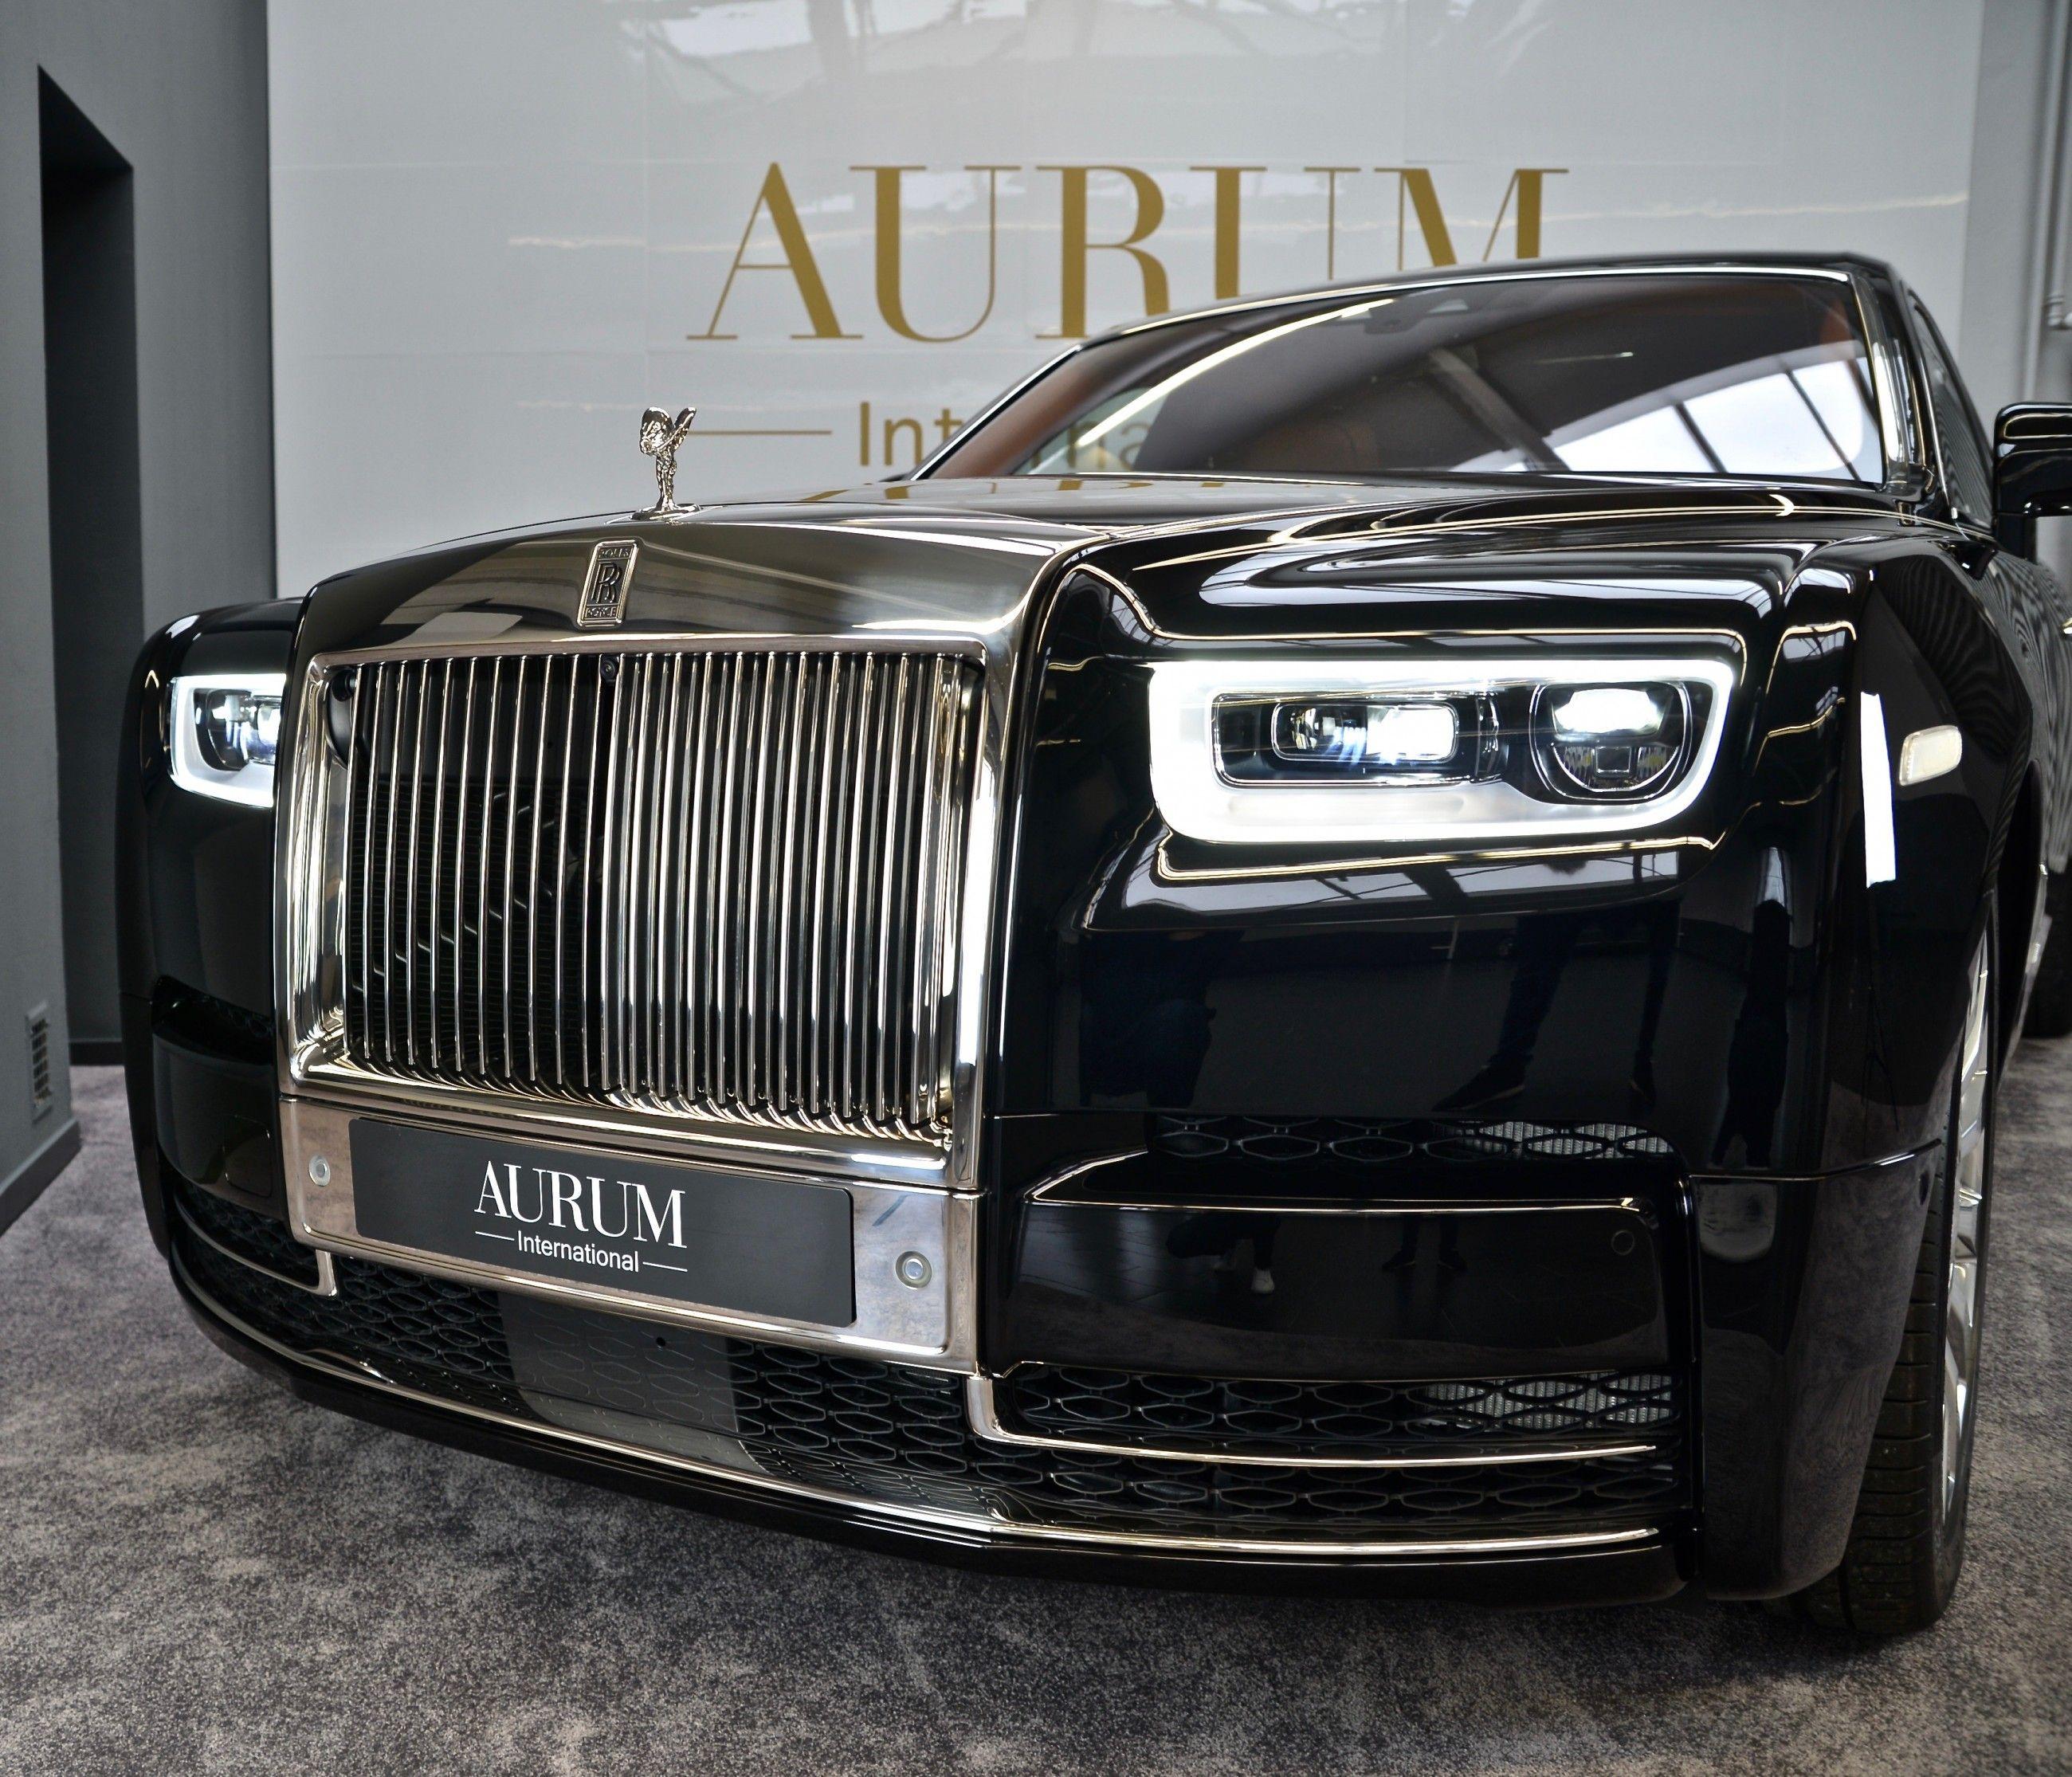 Rolls Royce Phantom Viii Aurum International Germany For Sale On Luxurypulse Rolls Royce Rolls Royce Phantom Royce